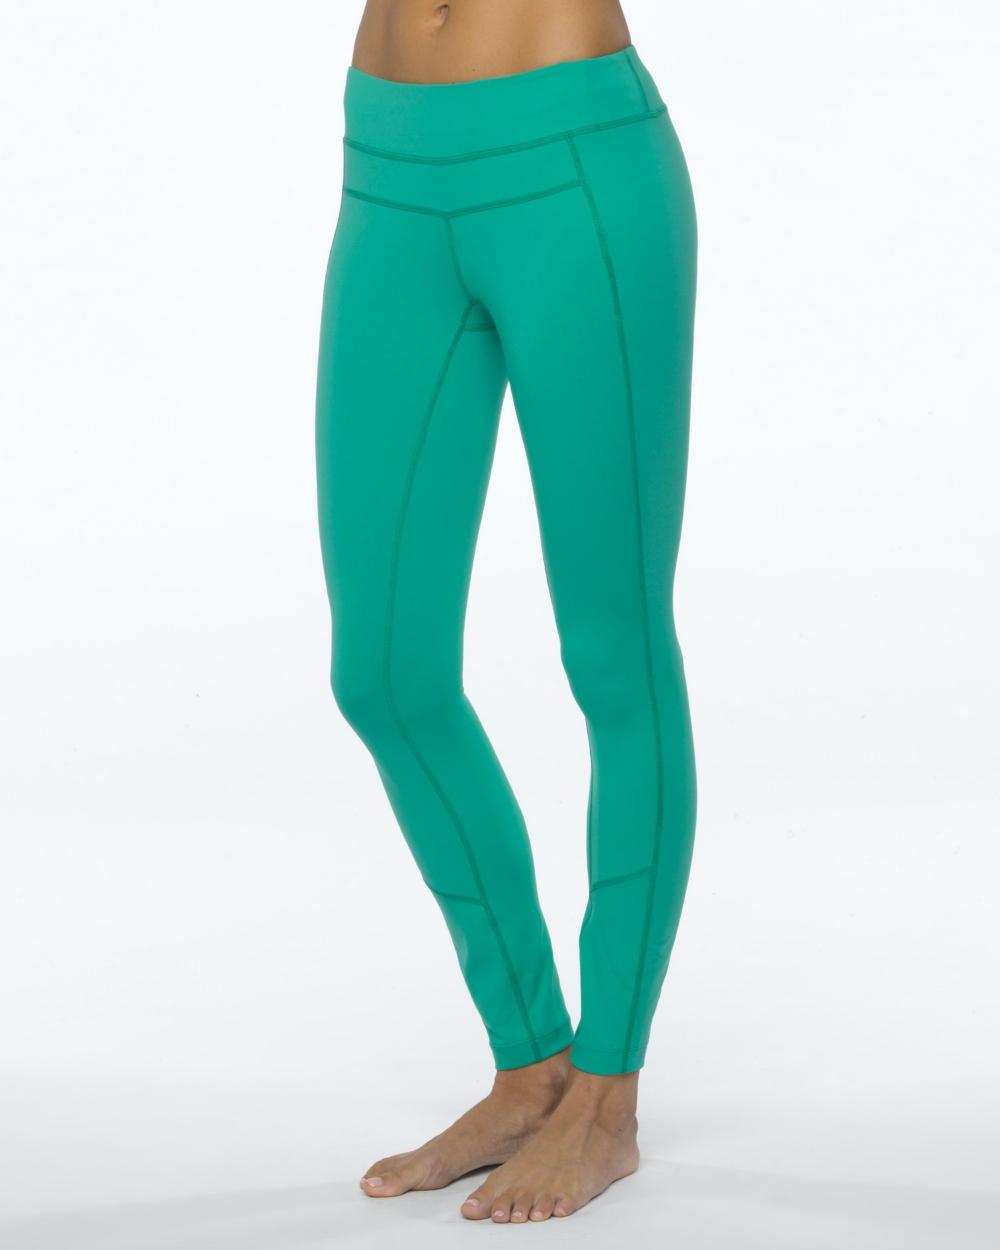 2015 Prana Activewear Gabi Legging in Cool Green